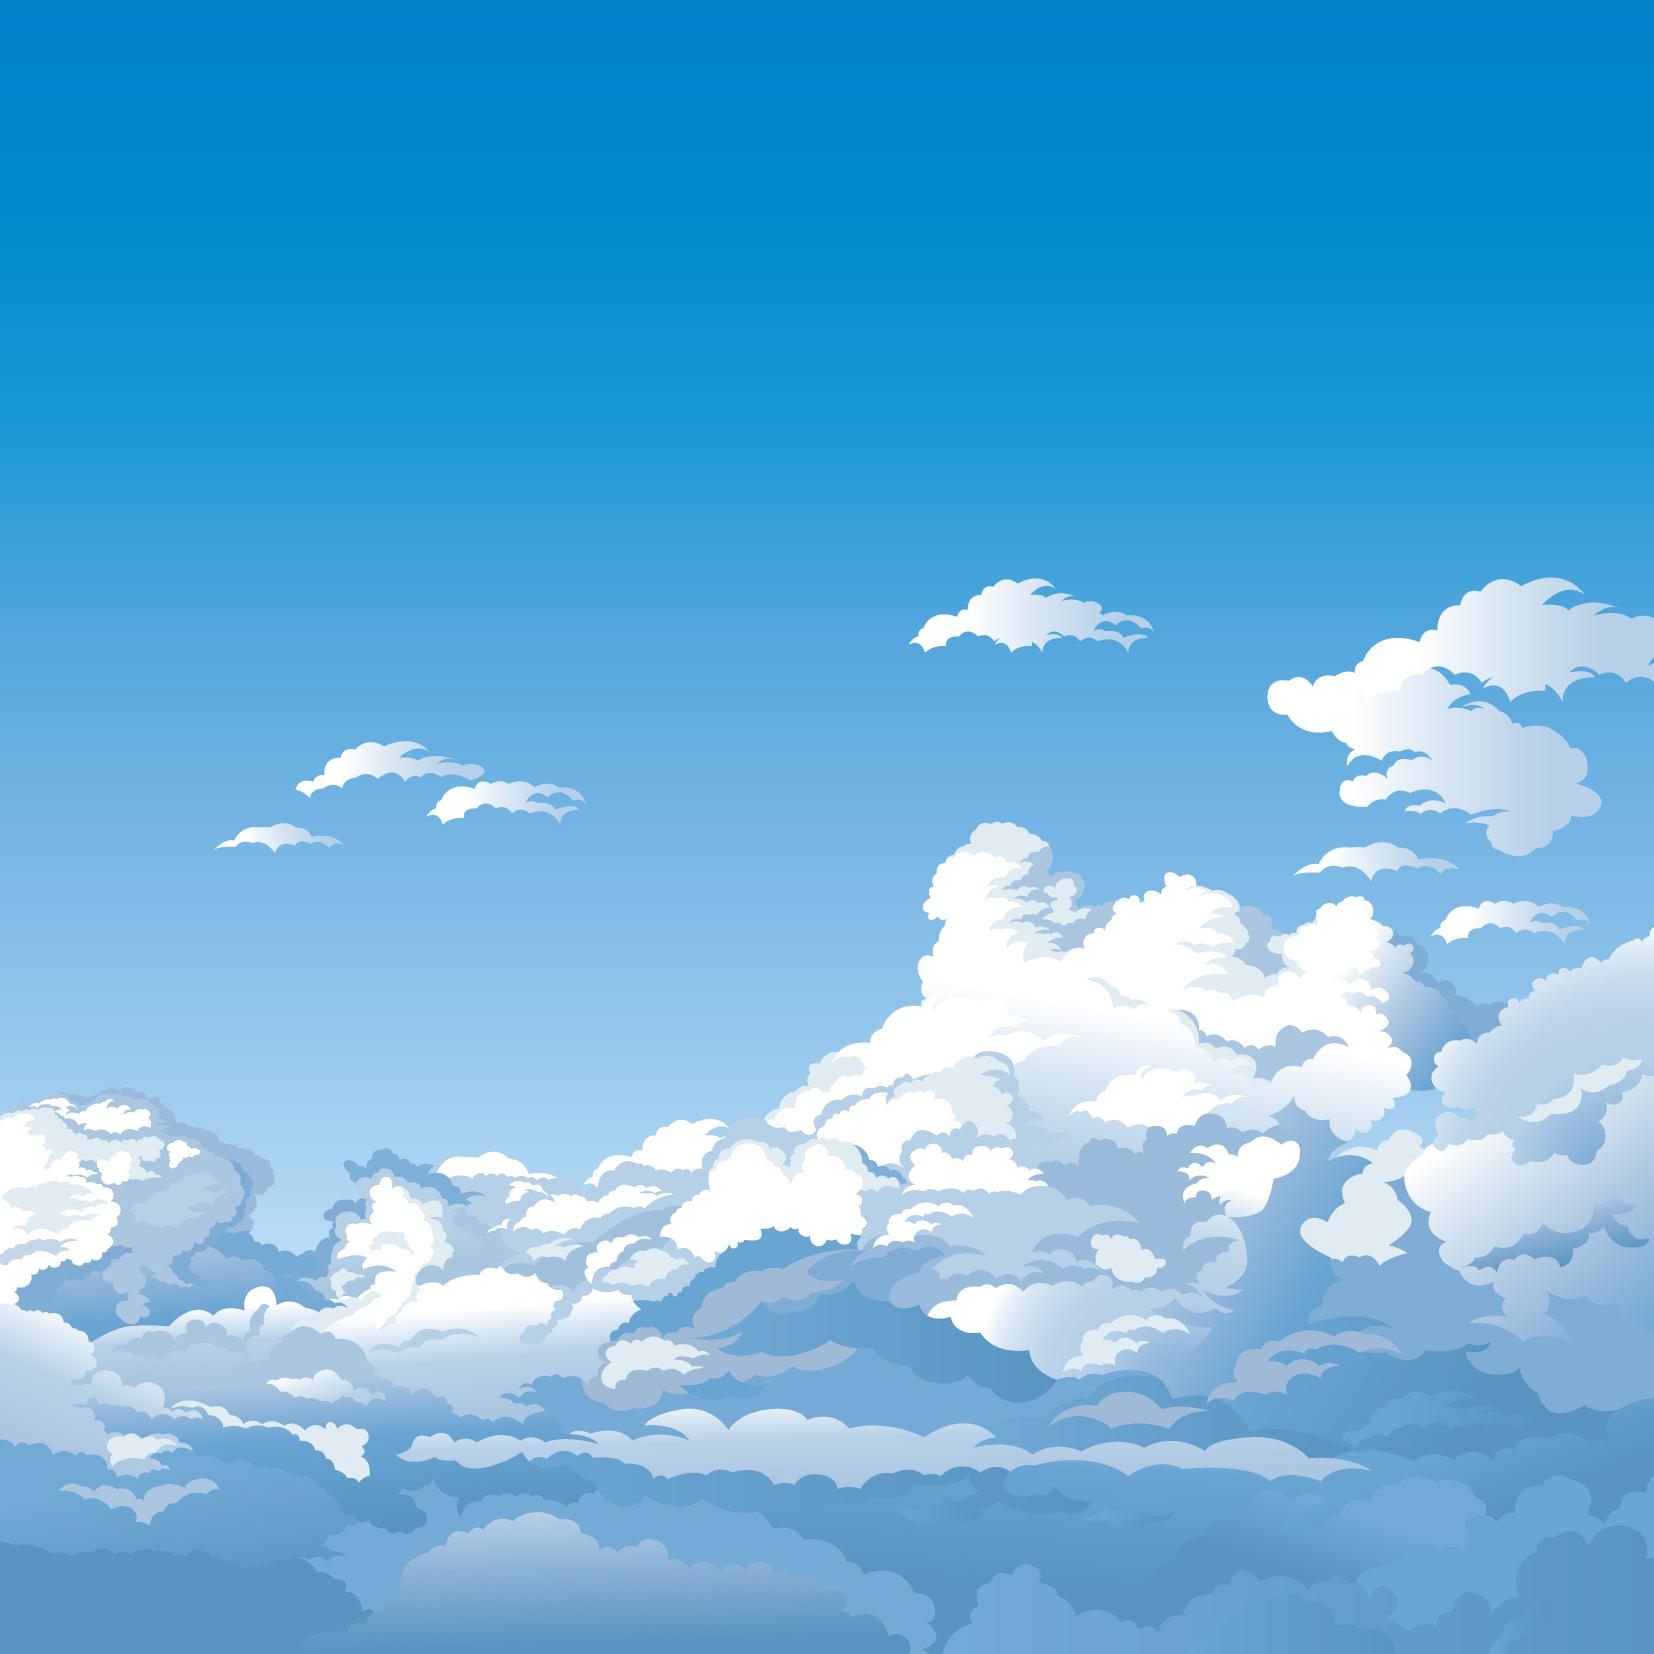 Cielo con nuvole sky with clouds vettoriali gratis it free